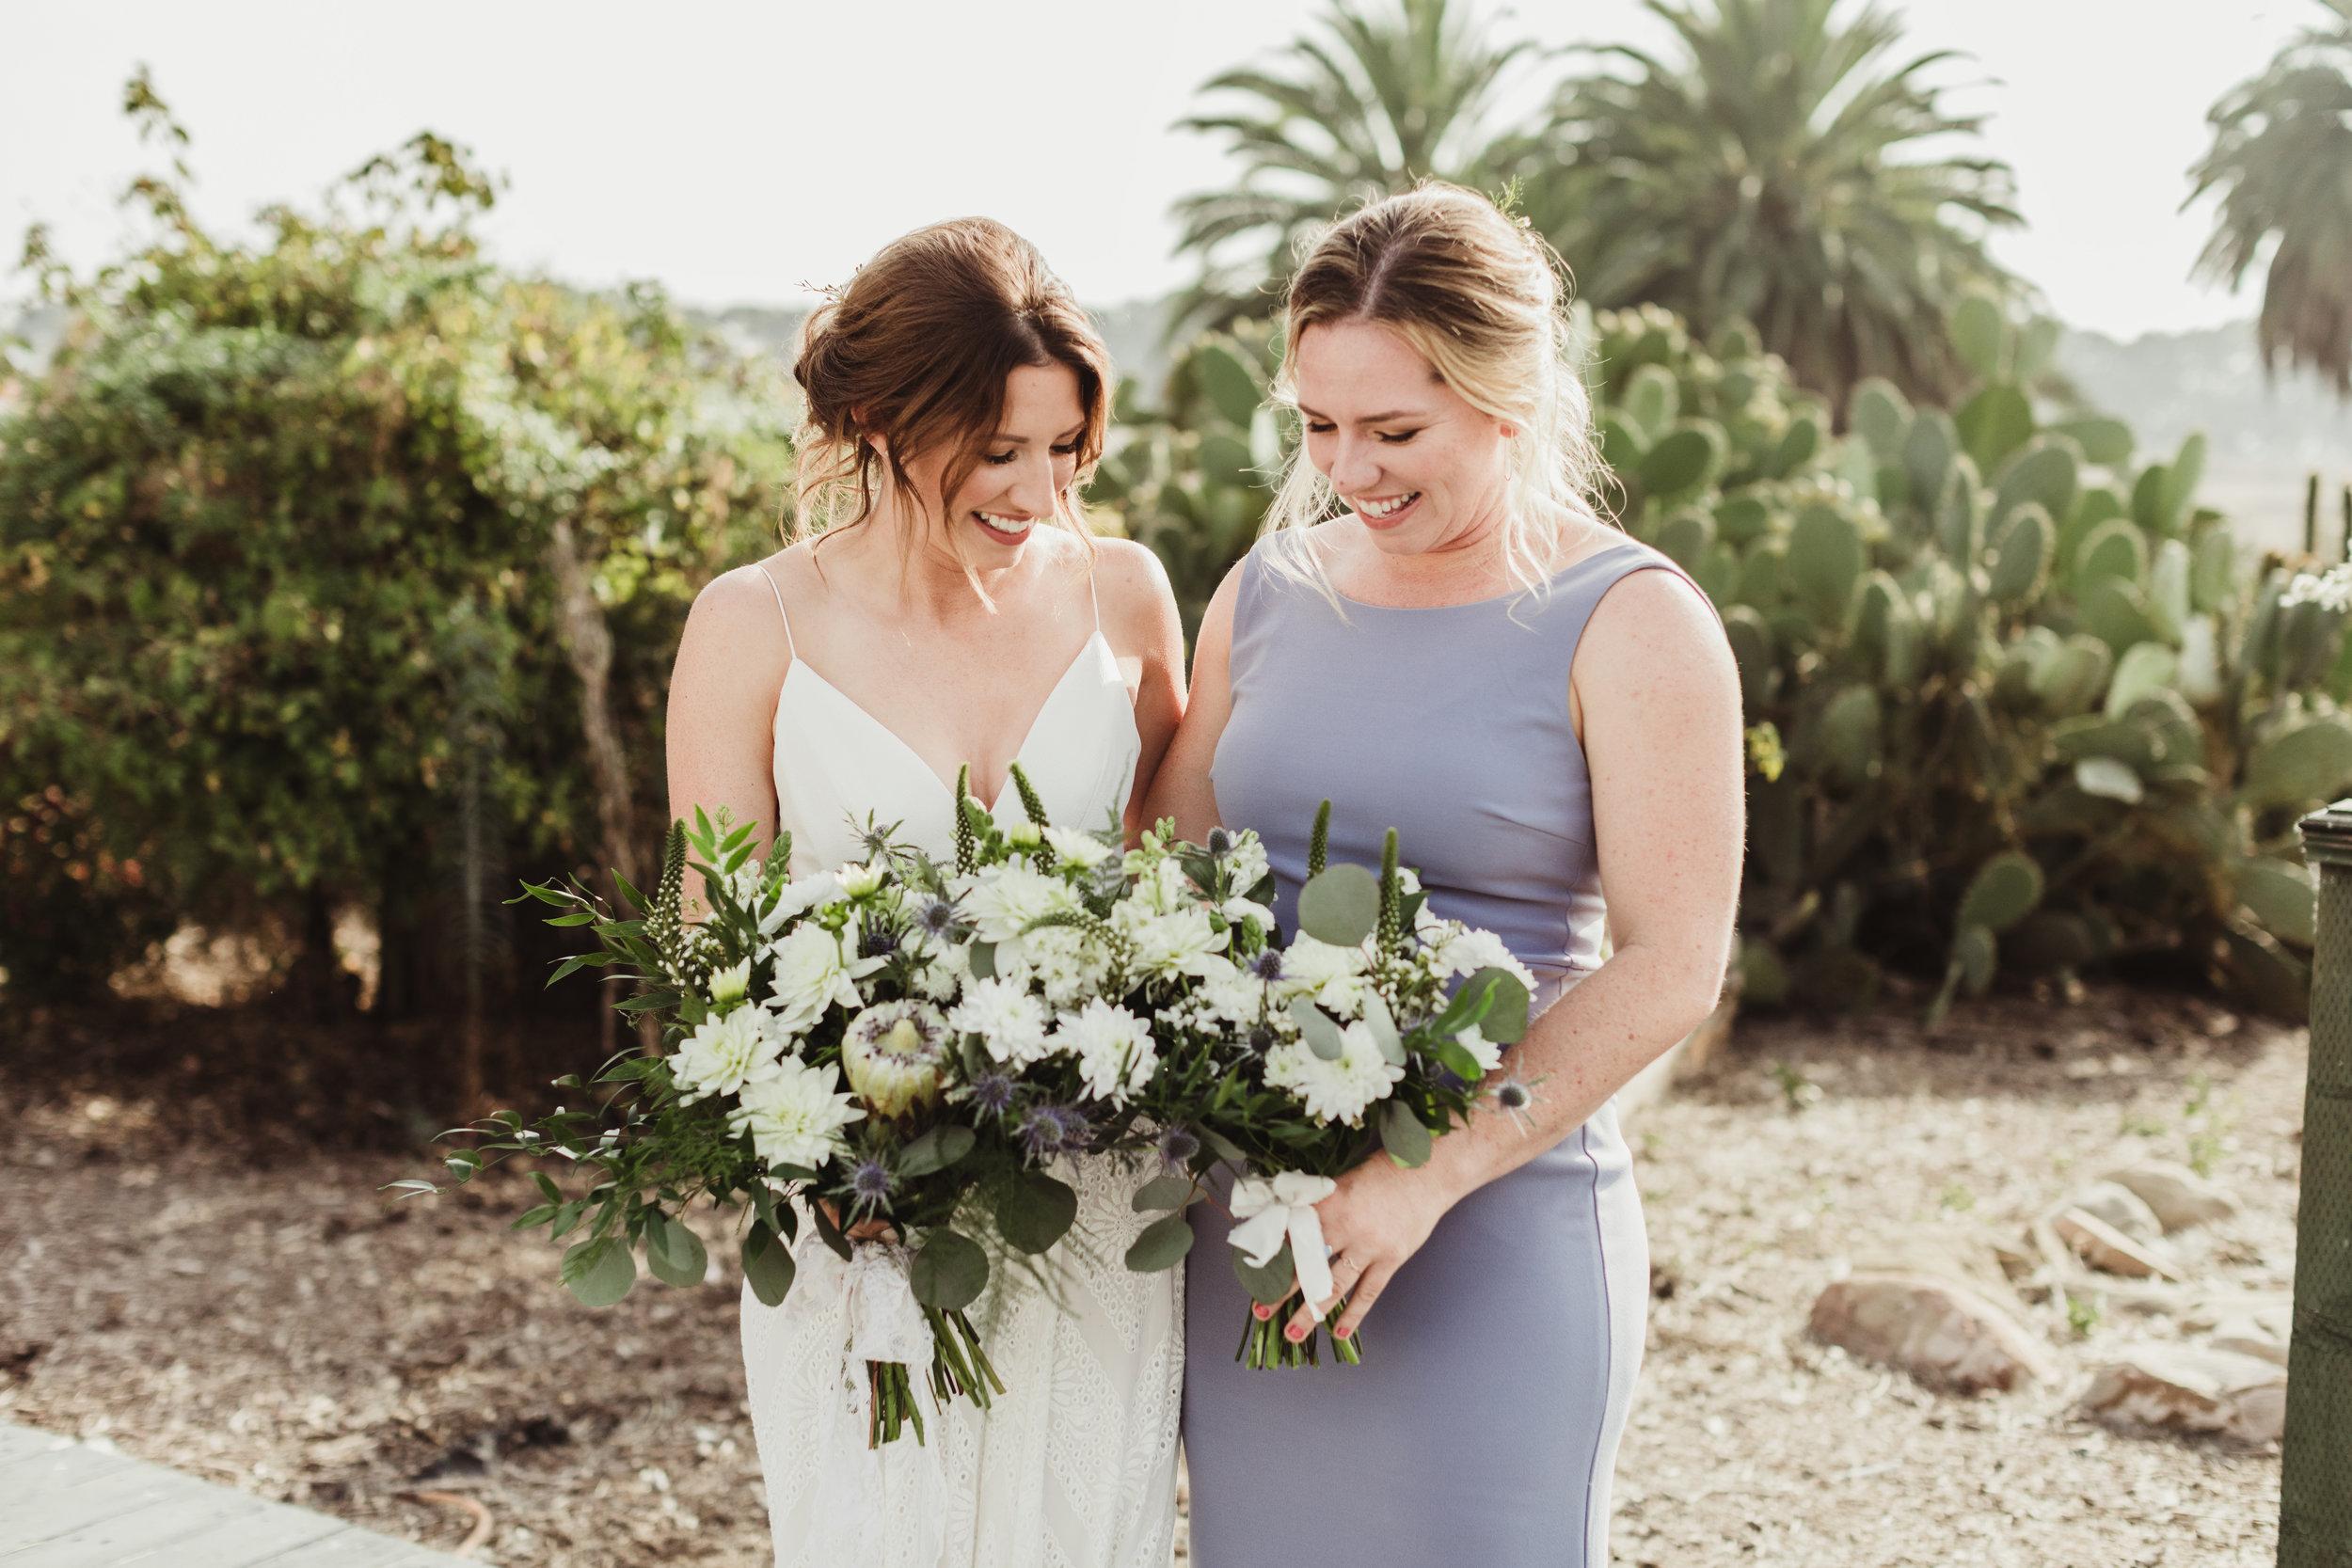 Jamie_English_Photography_JordanErik_Dos_Pueblos_Orchid_Wedding_Santa_Barbara_Fall2018-184.jpg